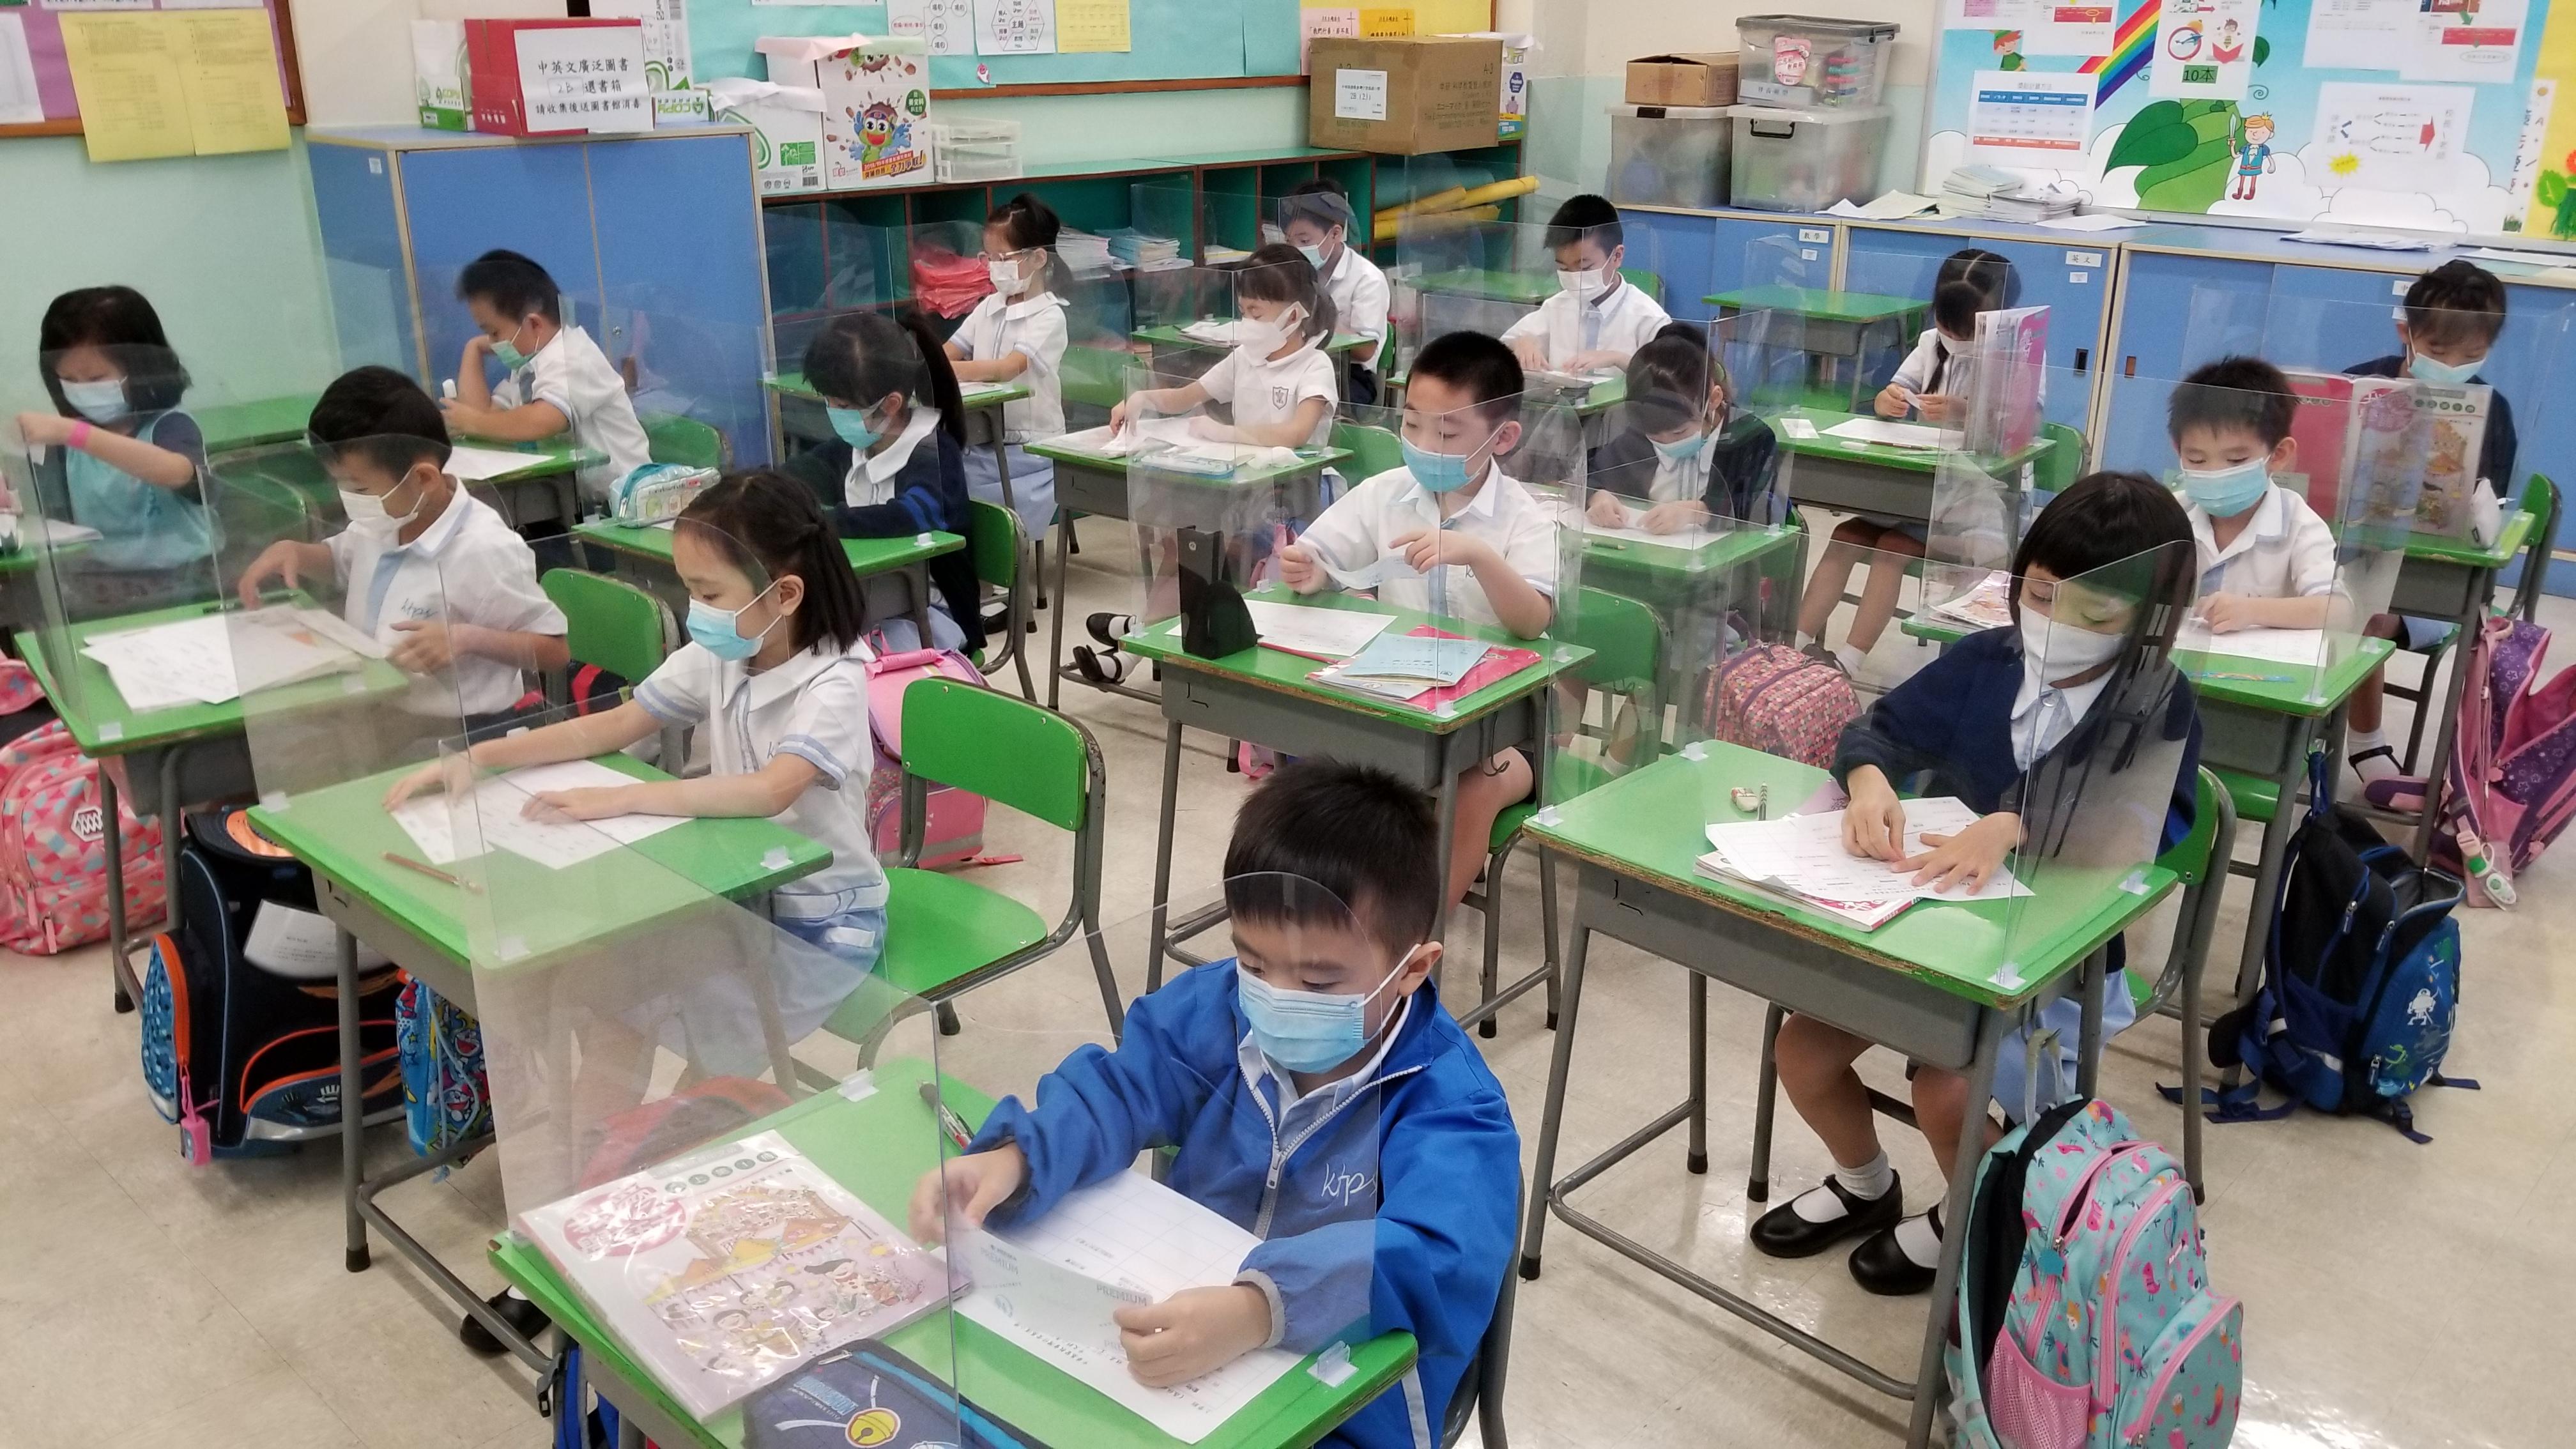 http://keito.school.hk/sites/default/files/20201015_085119.jpg